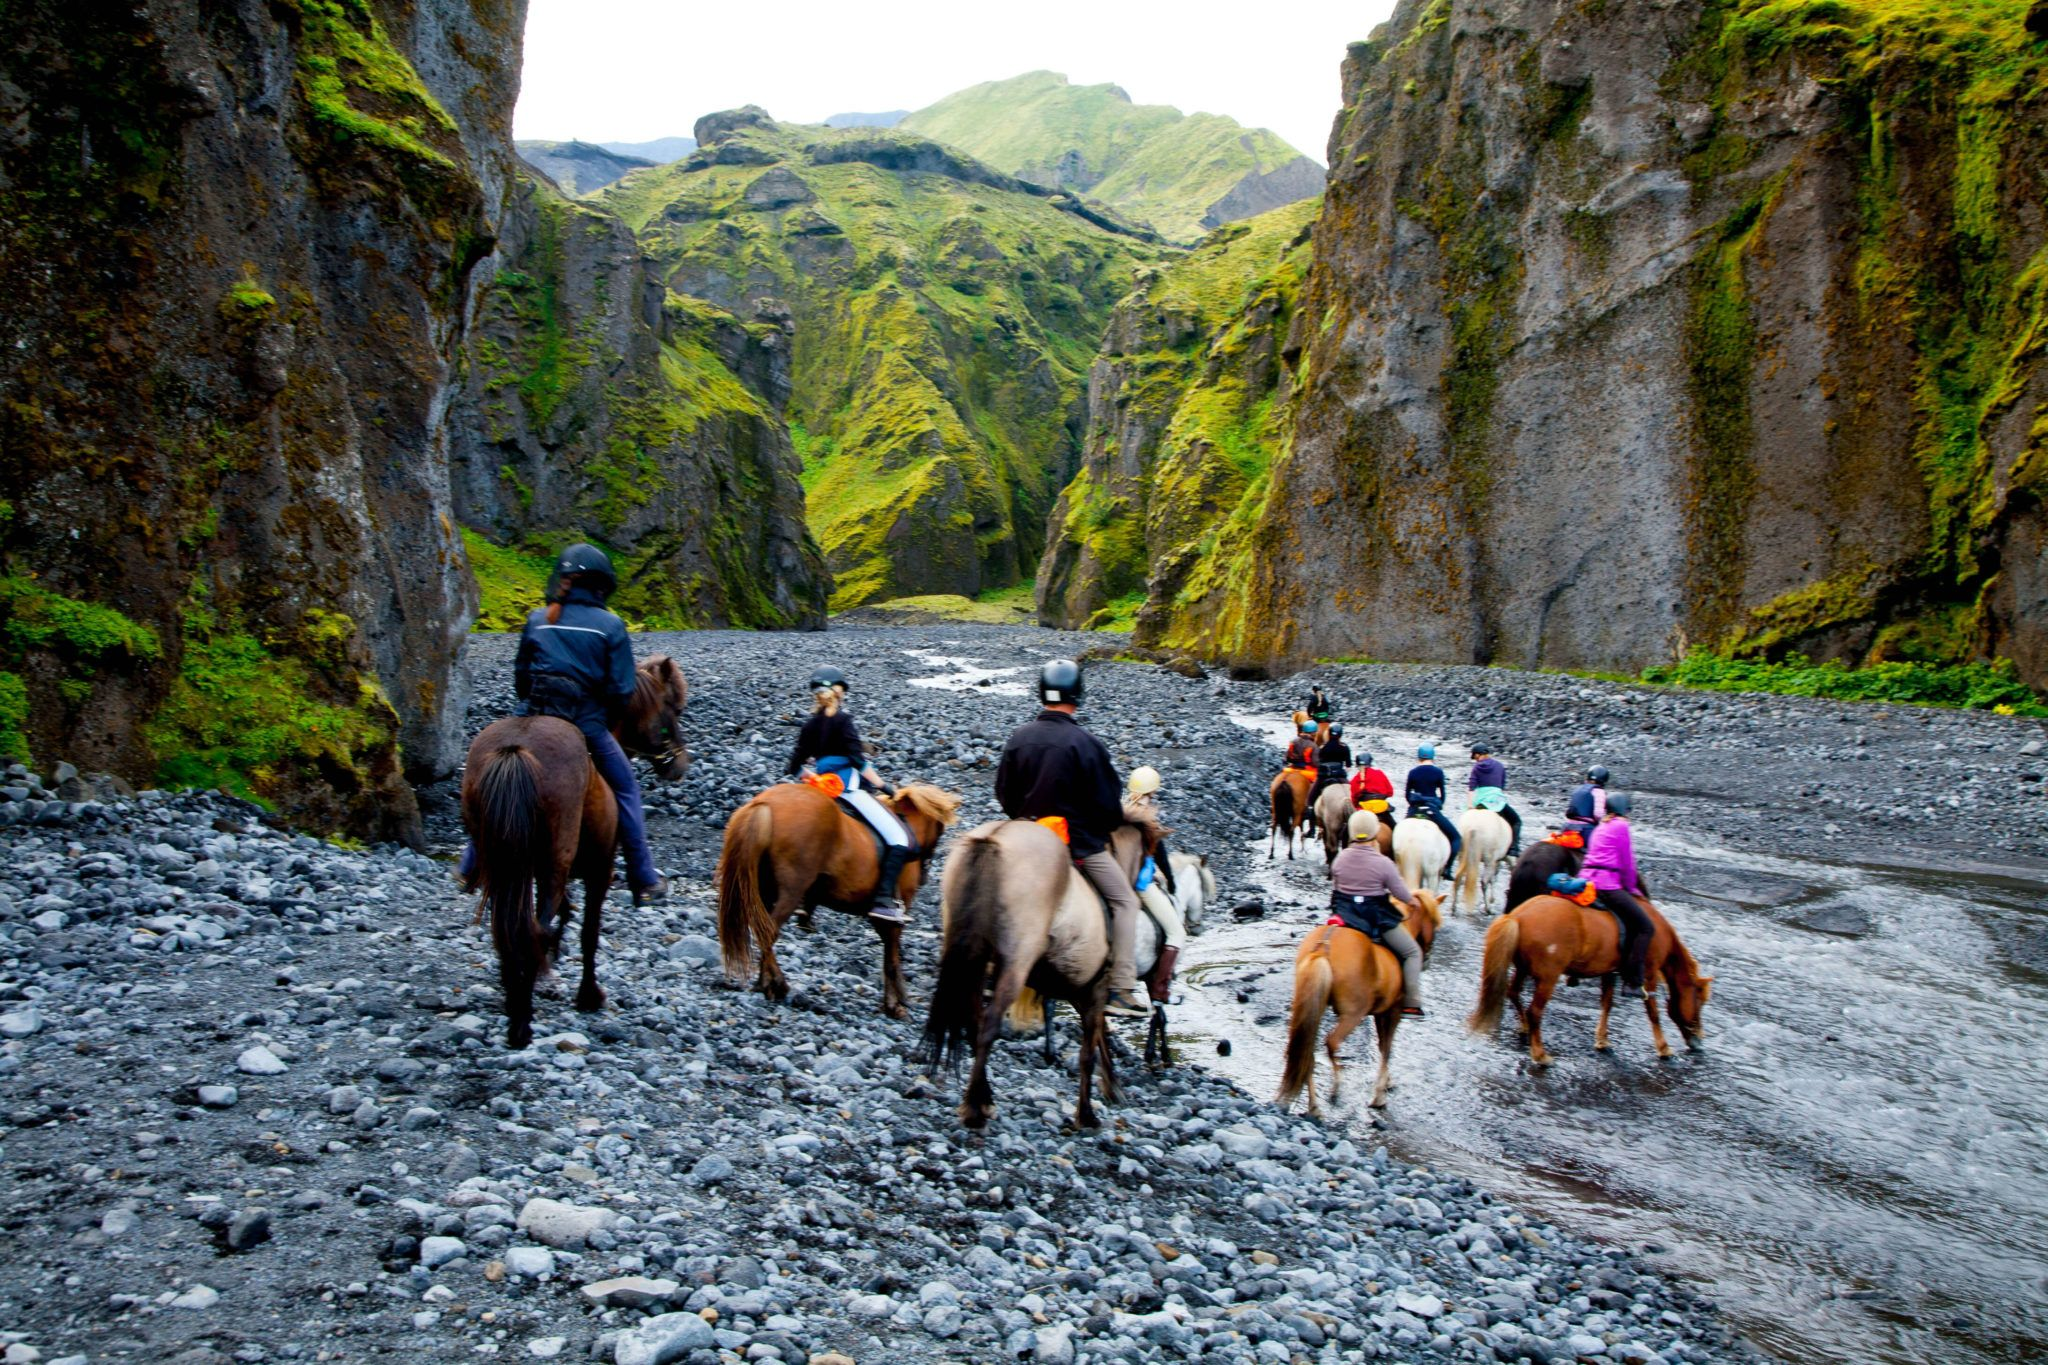 Guests exploring Iceland on horseback